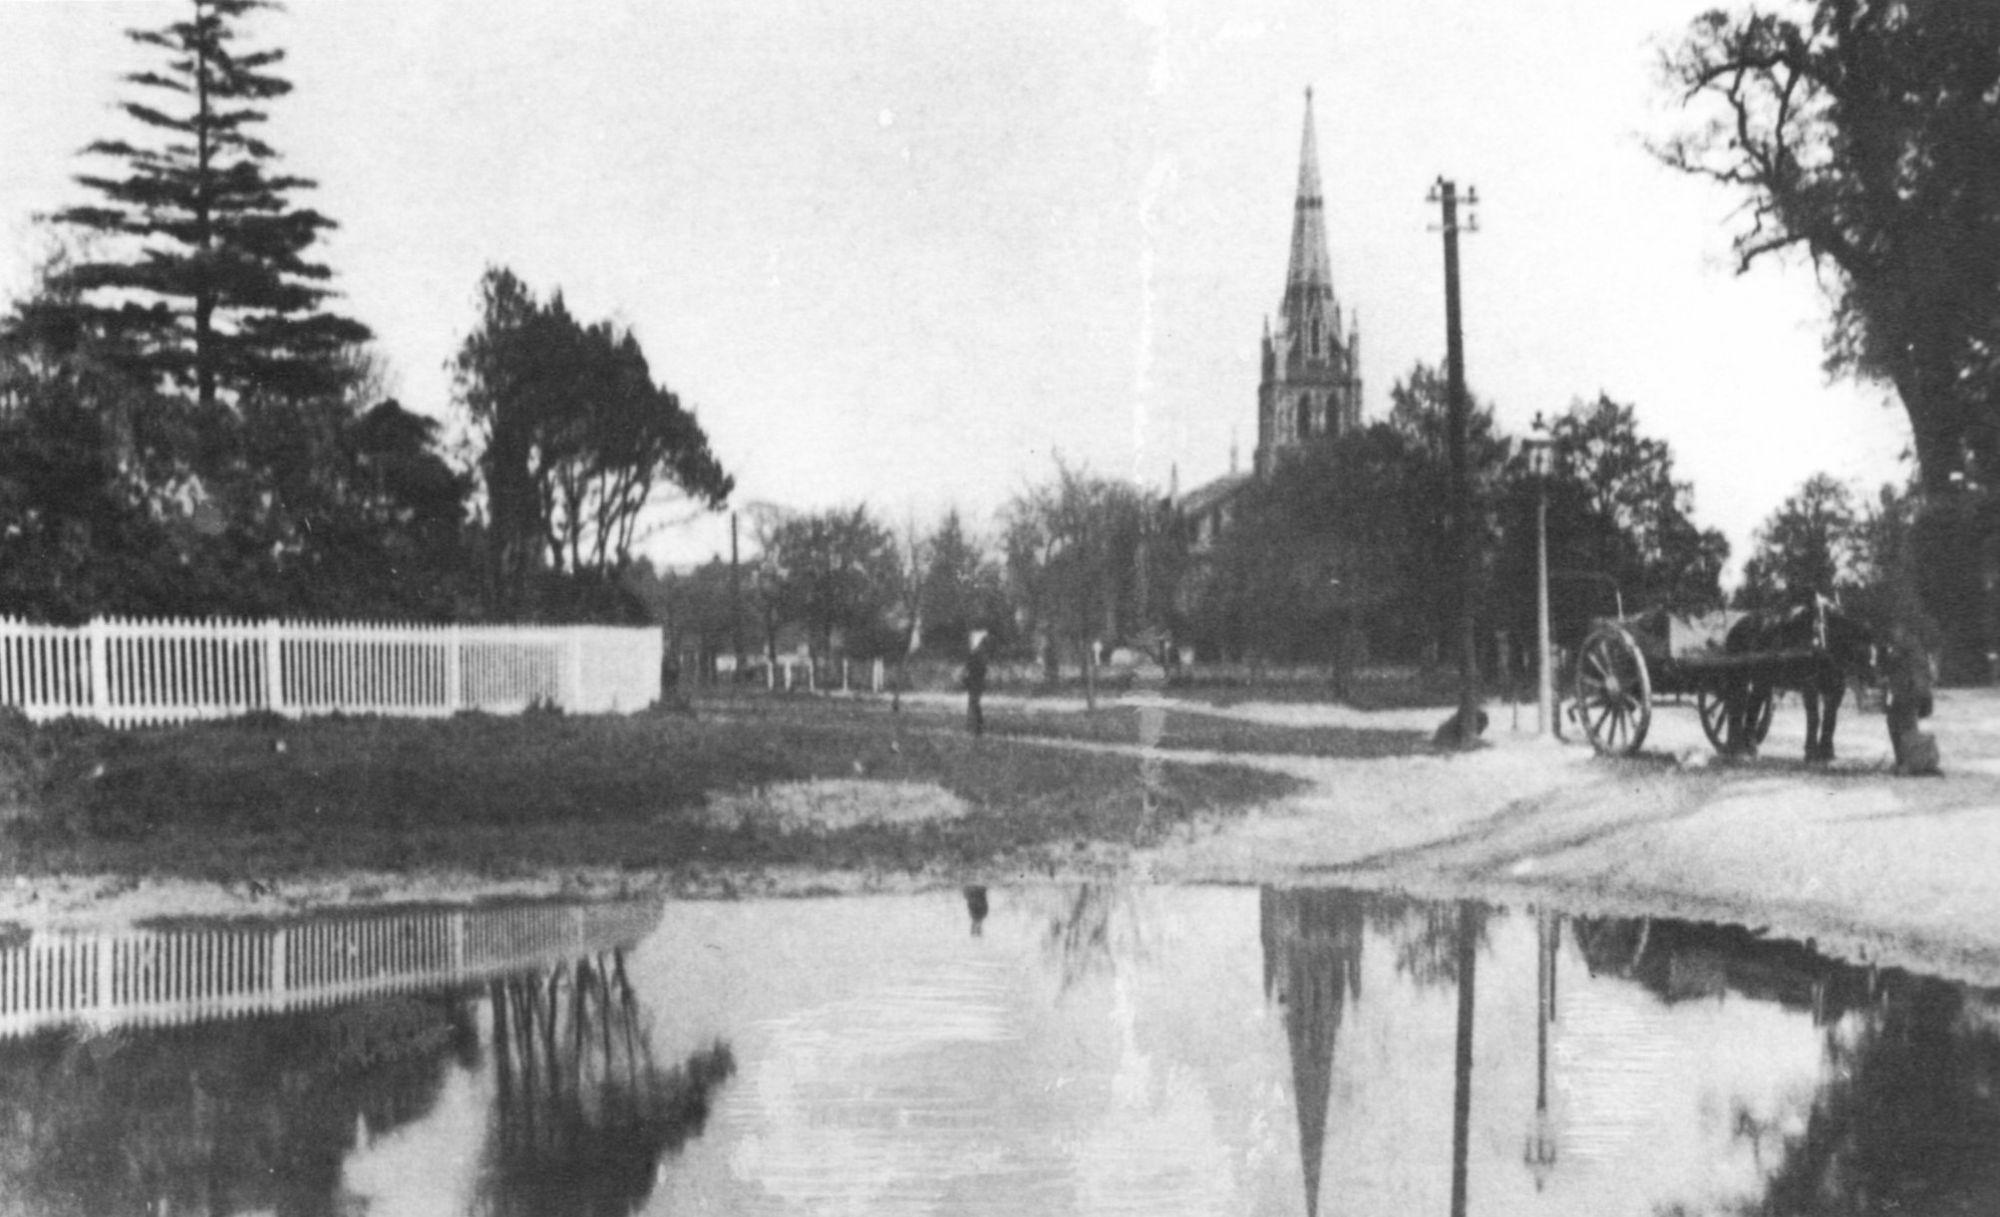 Chingford Green & Pond 1890s